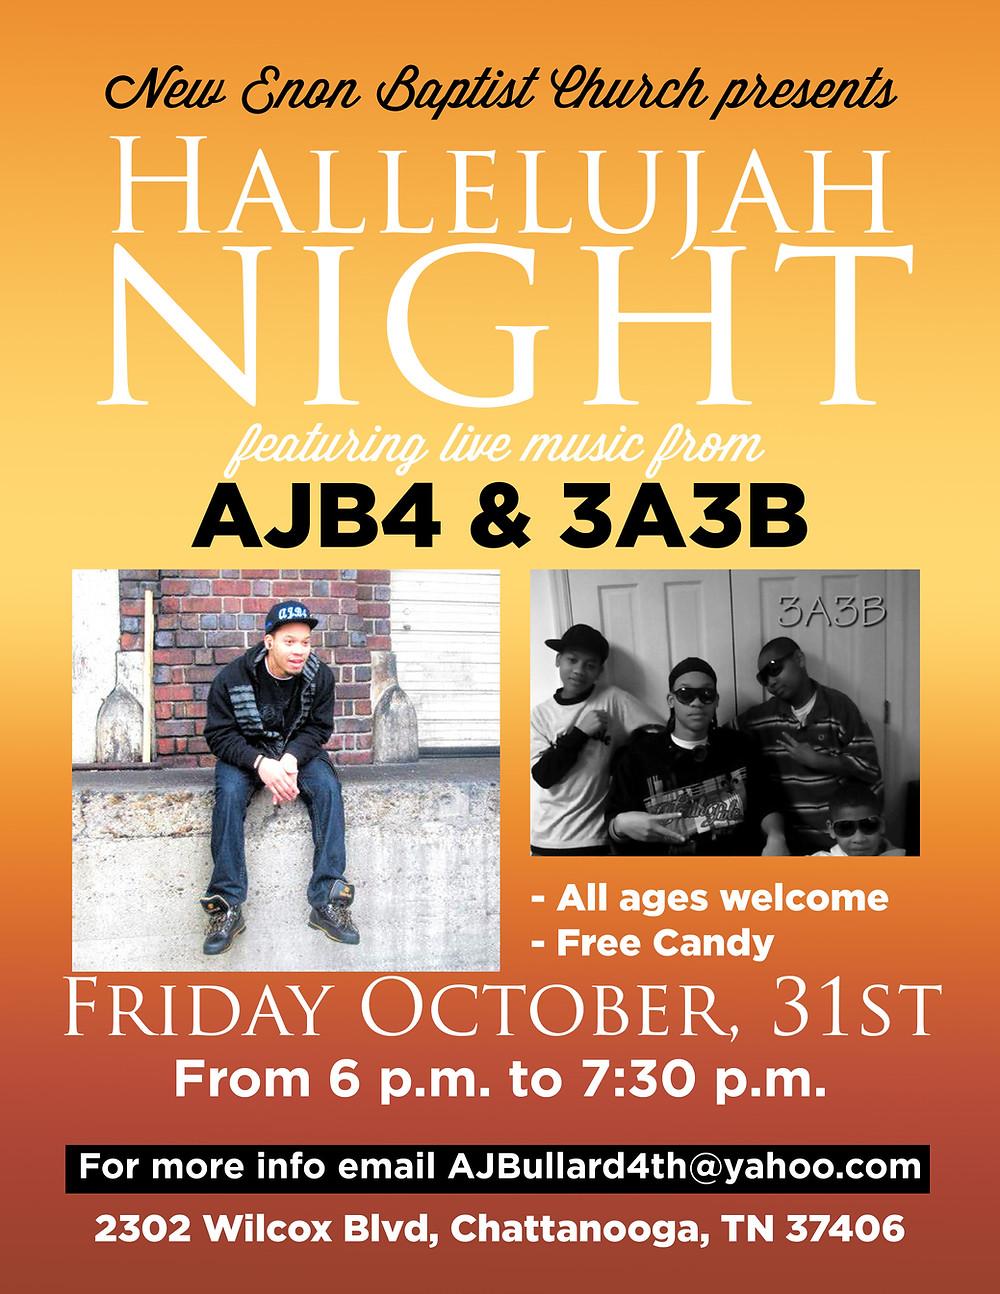 Hallelujah Night Flyer.jpg